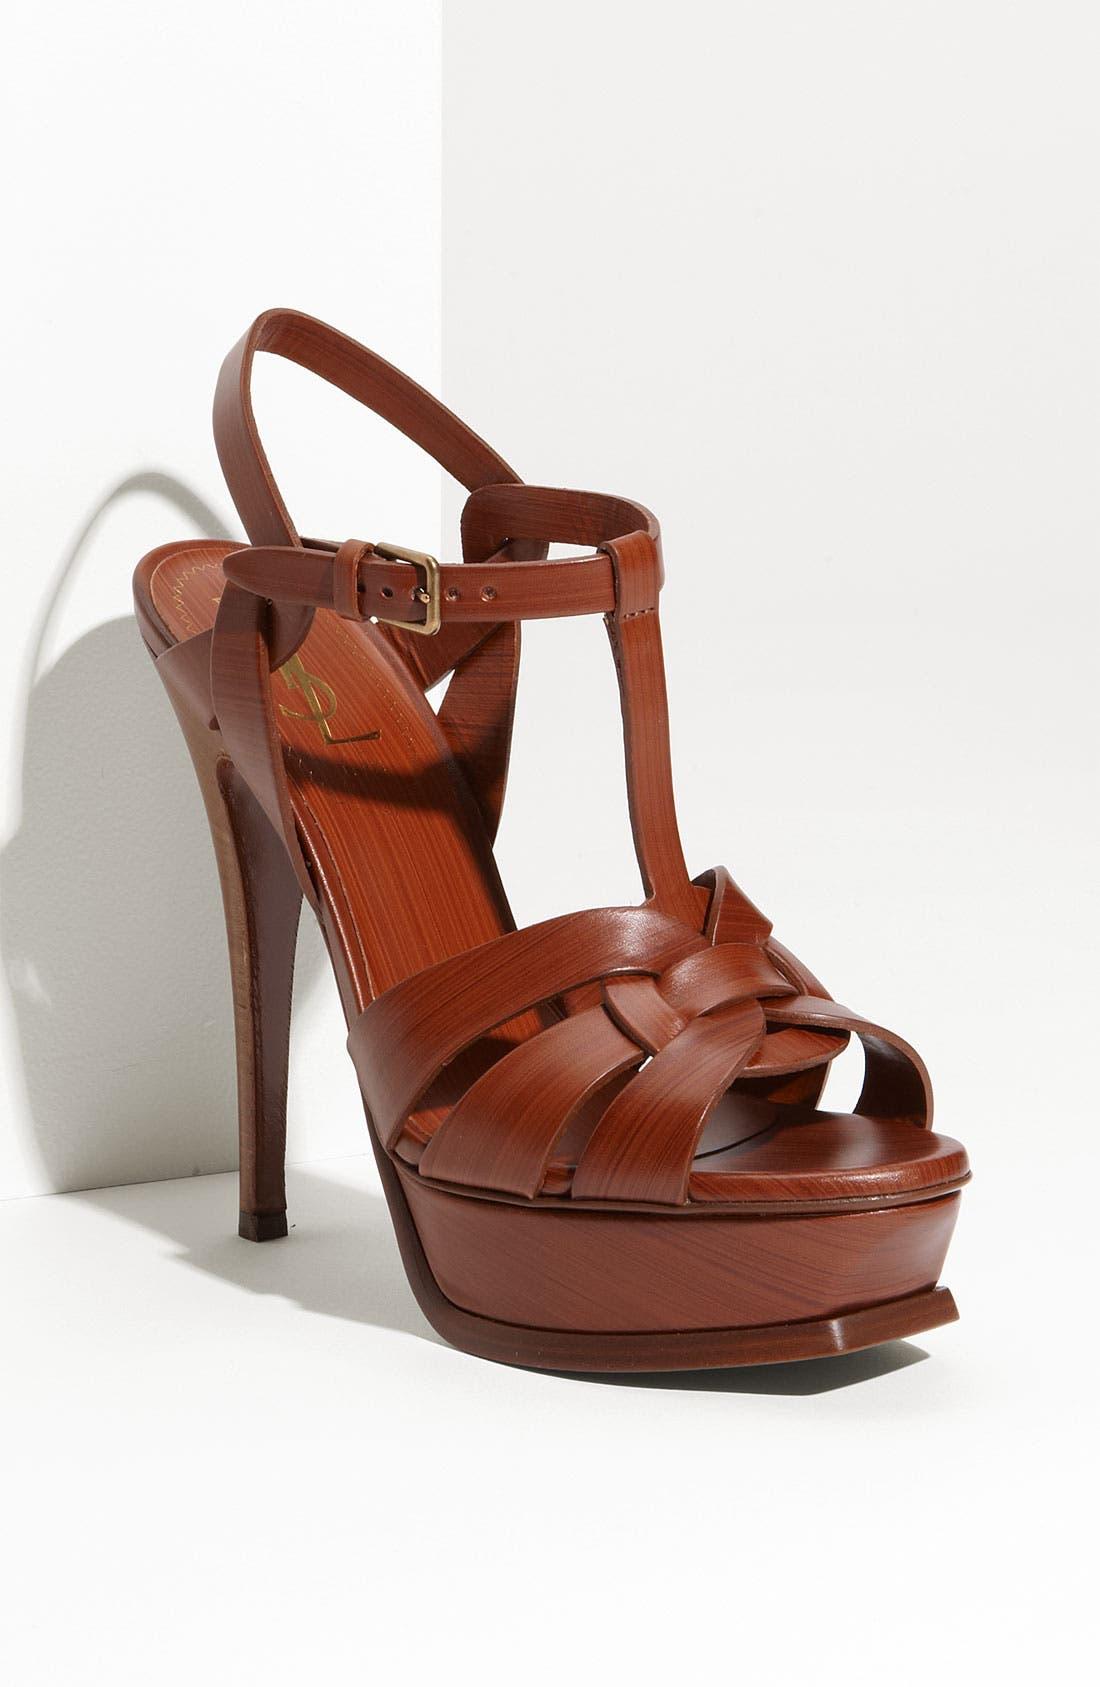 Main Image - Yves Saint Laurent 'Tribute' Platform Sandal